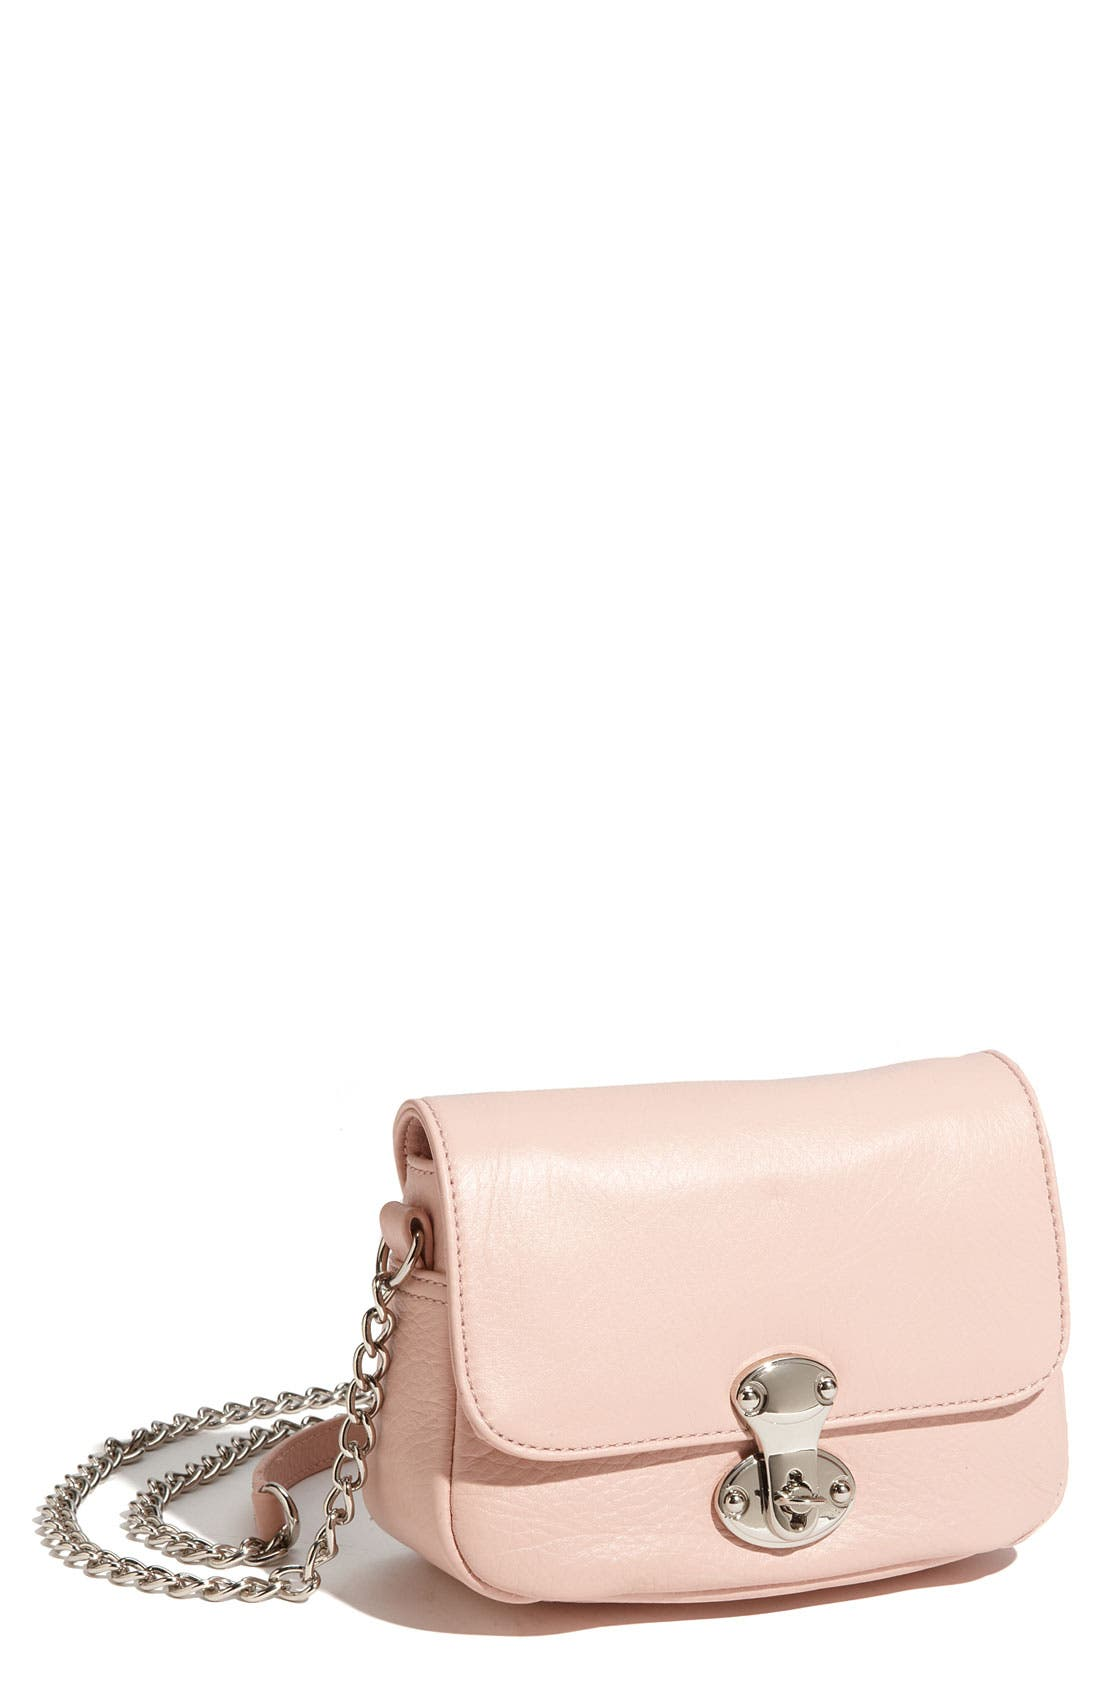 Alternate Image 1 Selected - Franchi Leather Flap Crossbody Bag